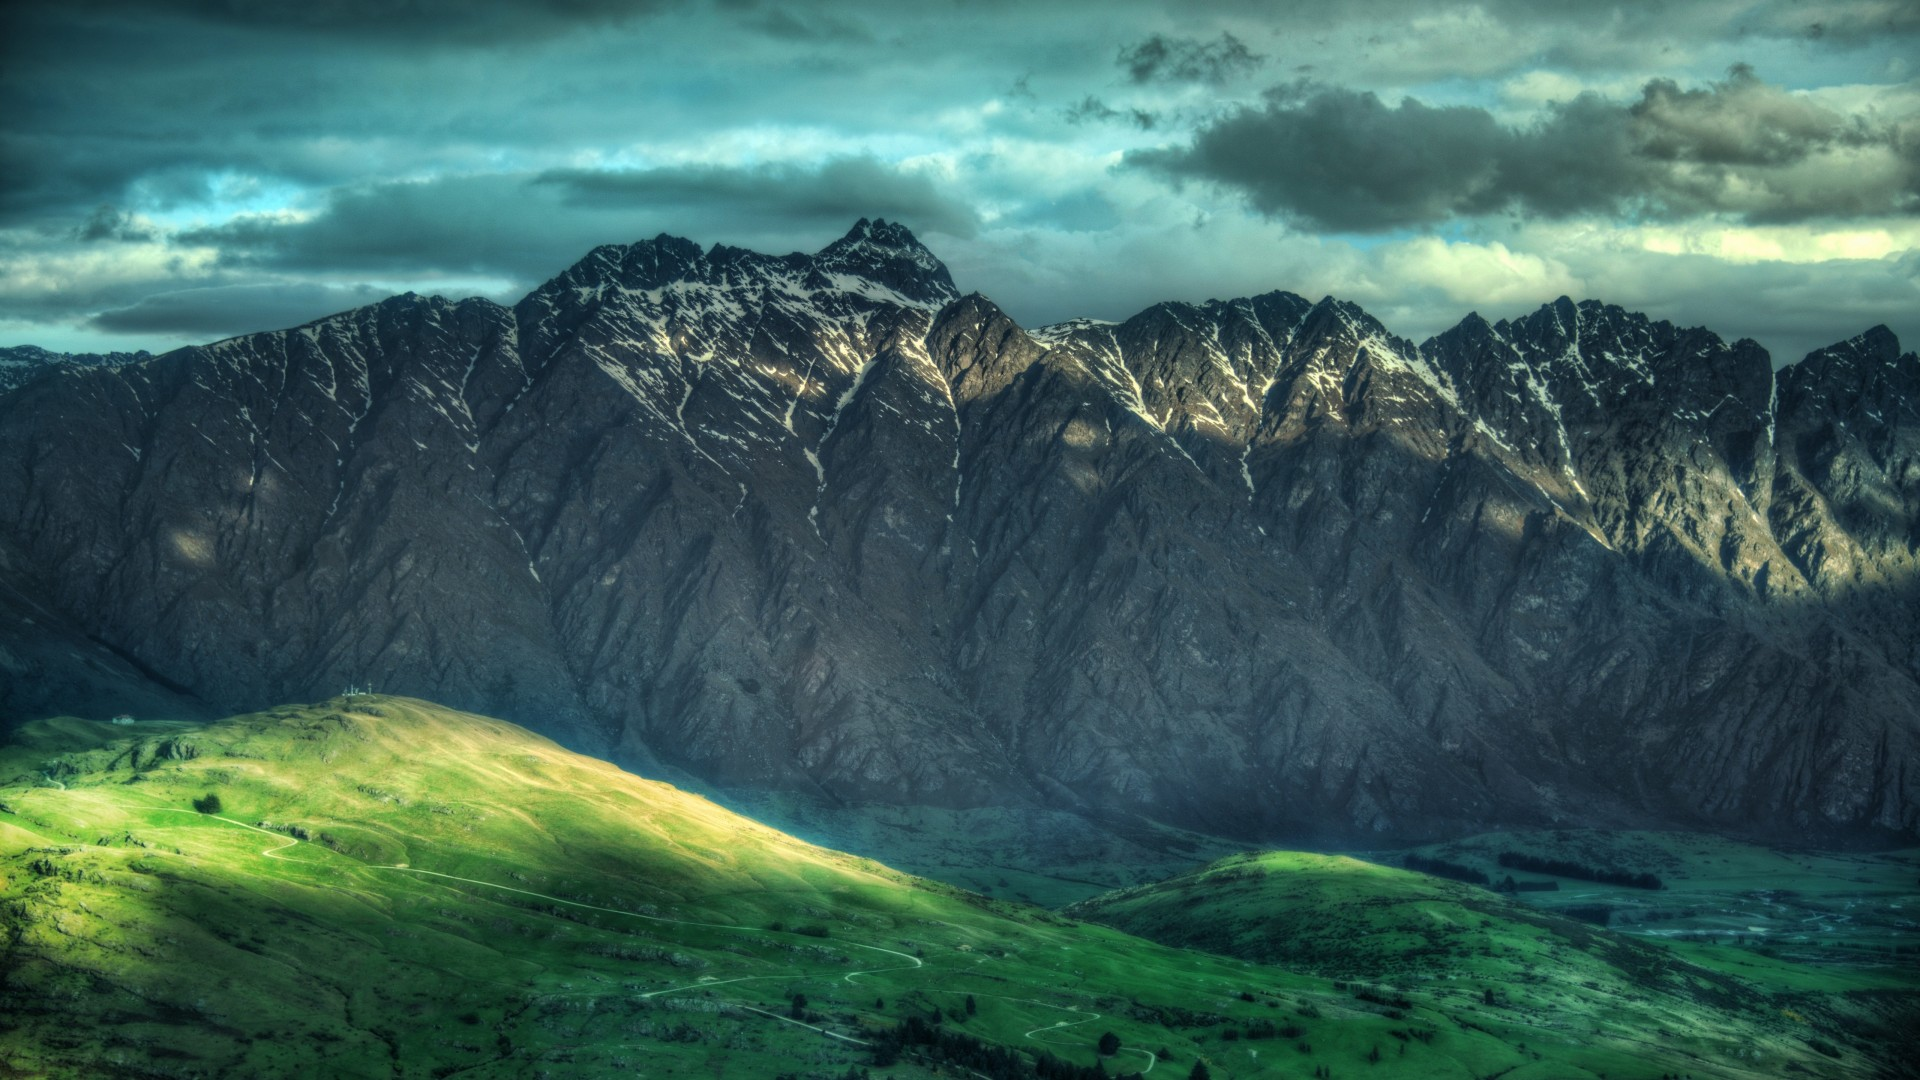 New Zealand 5k 4k Wallpaper 8k Mountain Island Clouds